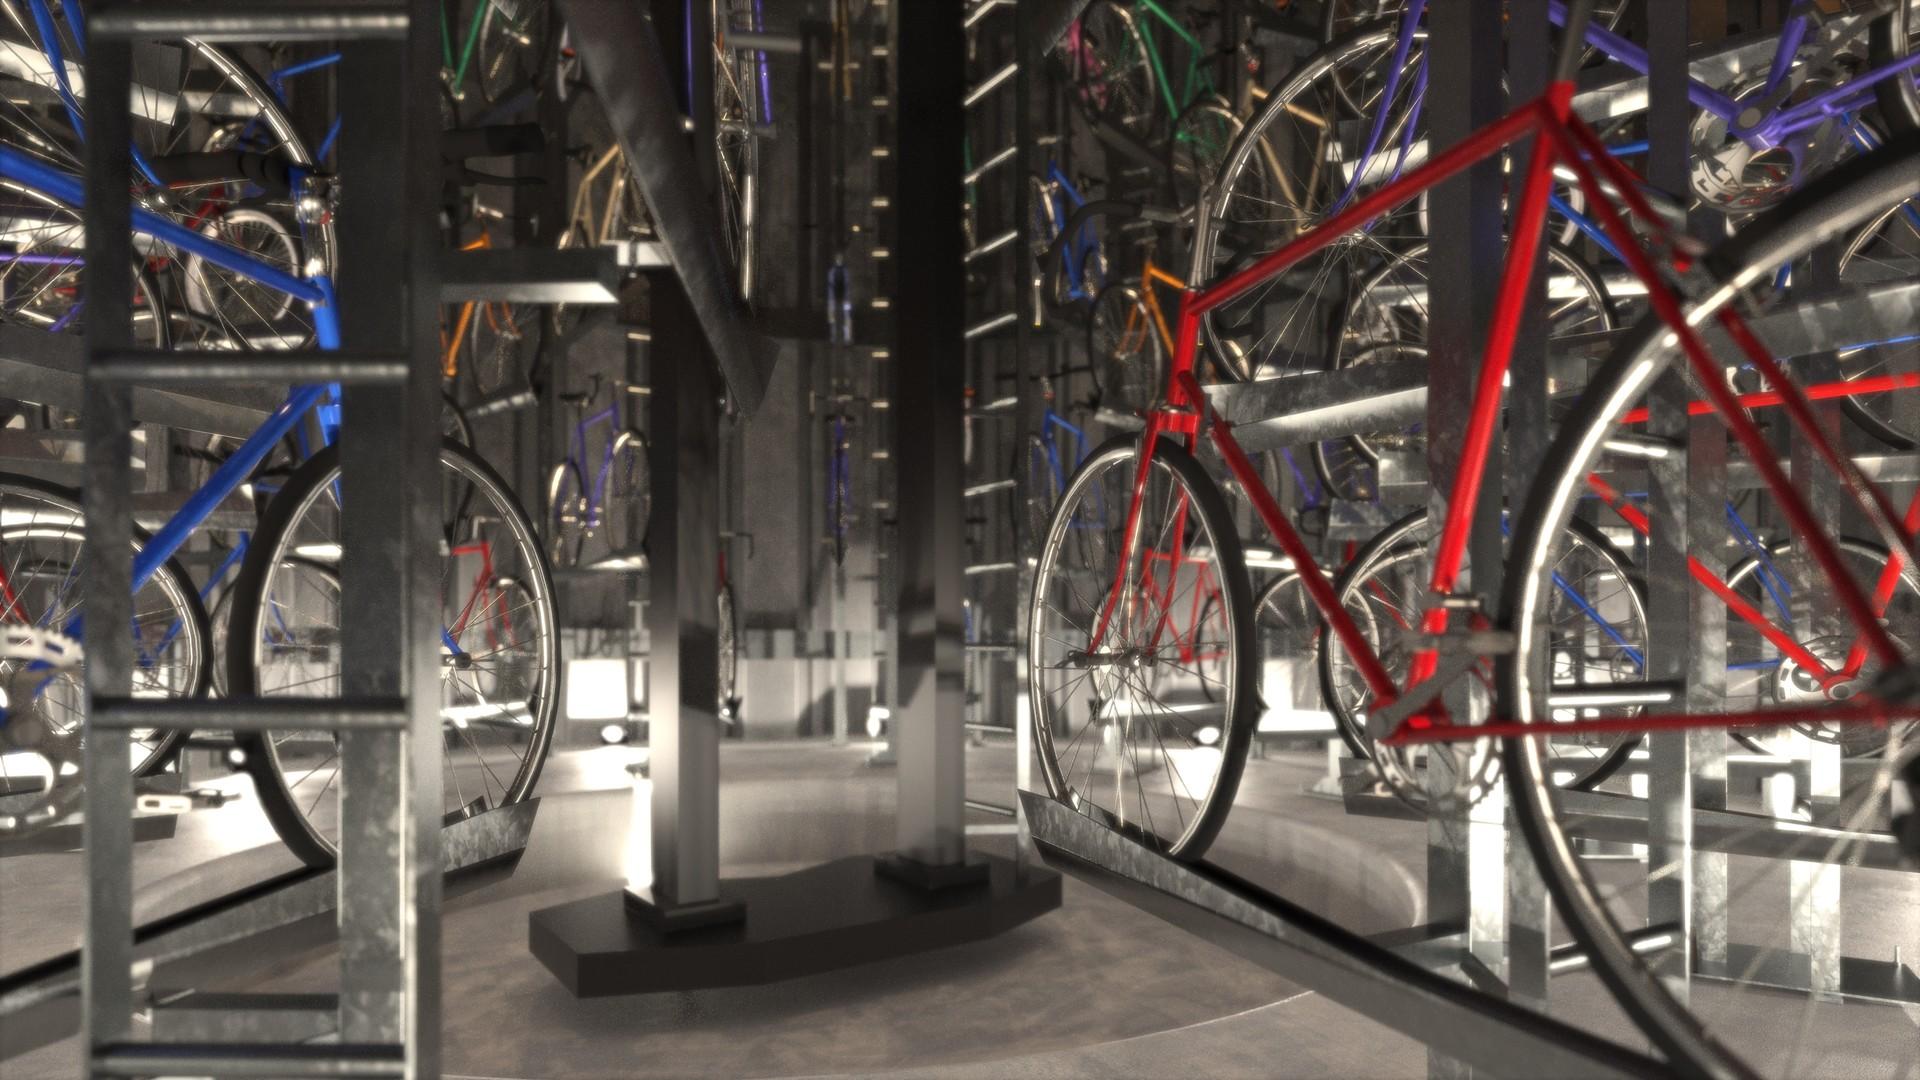 Duane kemp 10 eco cycle build 2017 scene 1b 3413x192016 9 2h59m optura981111 crf